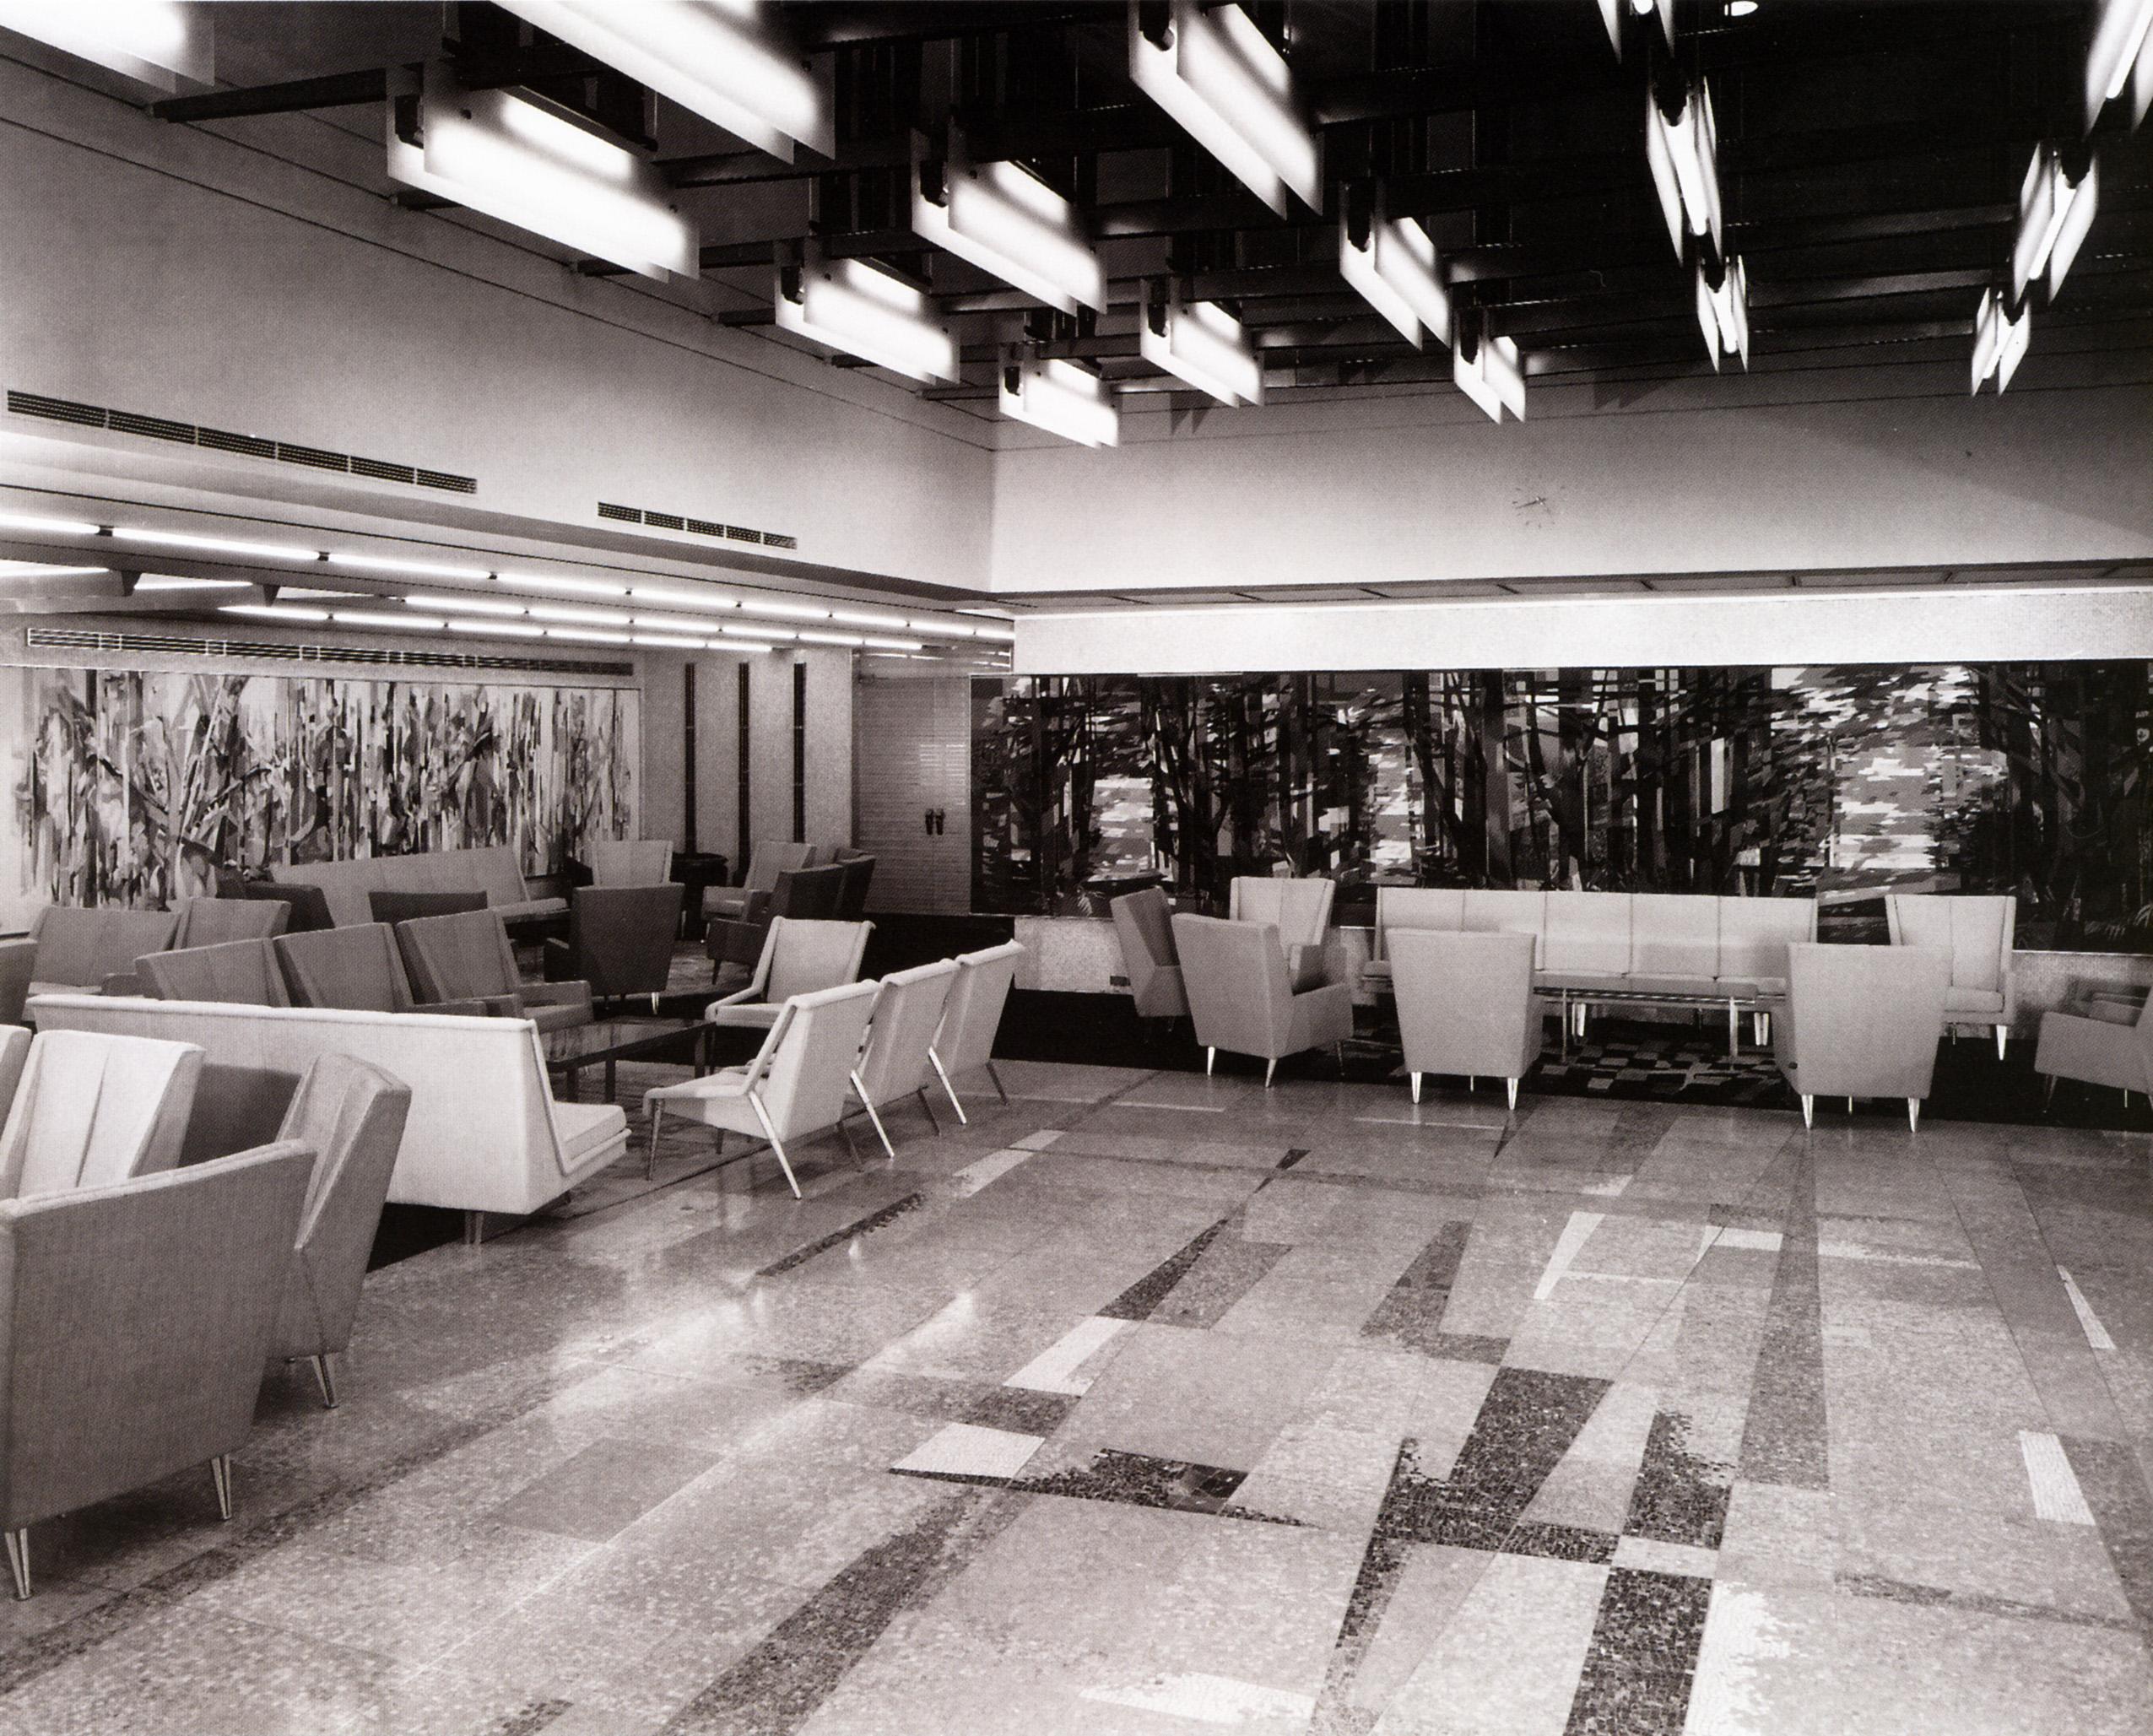 FileGrand salon de premire classe du Paquebot France structure aluminium 1962jpg